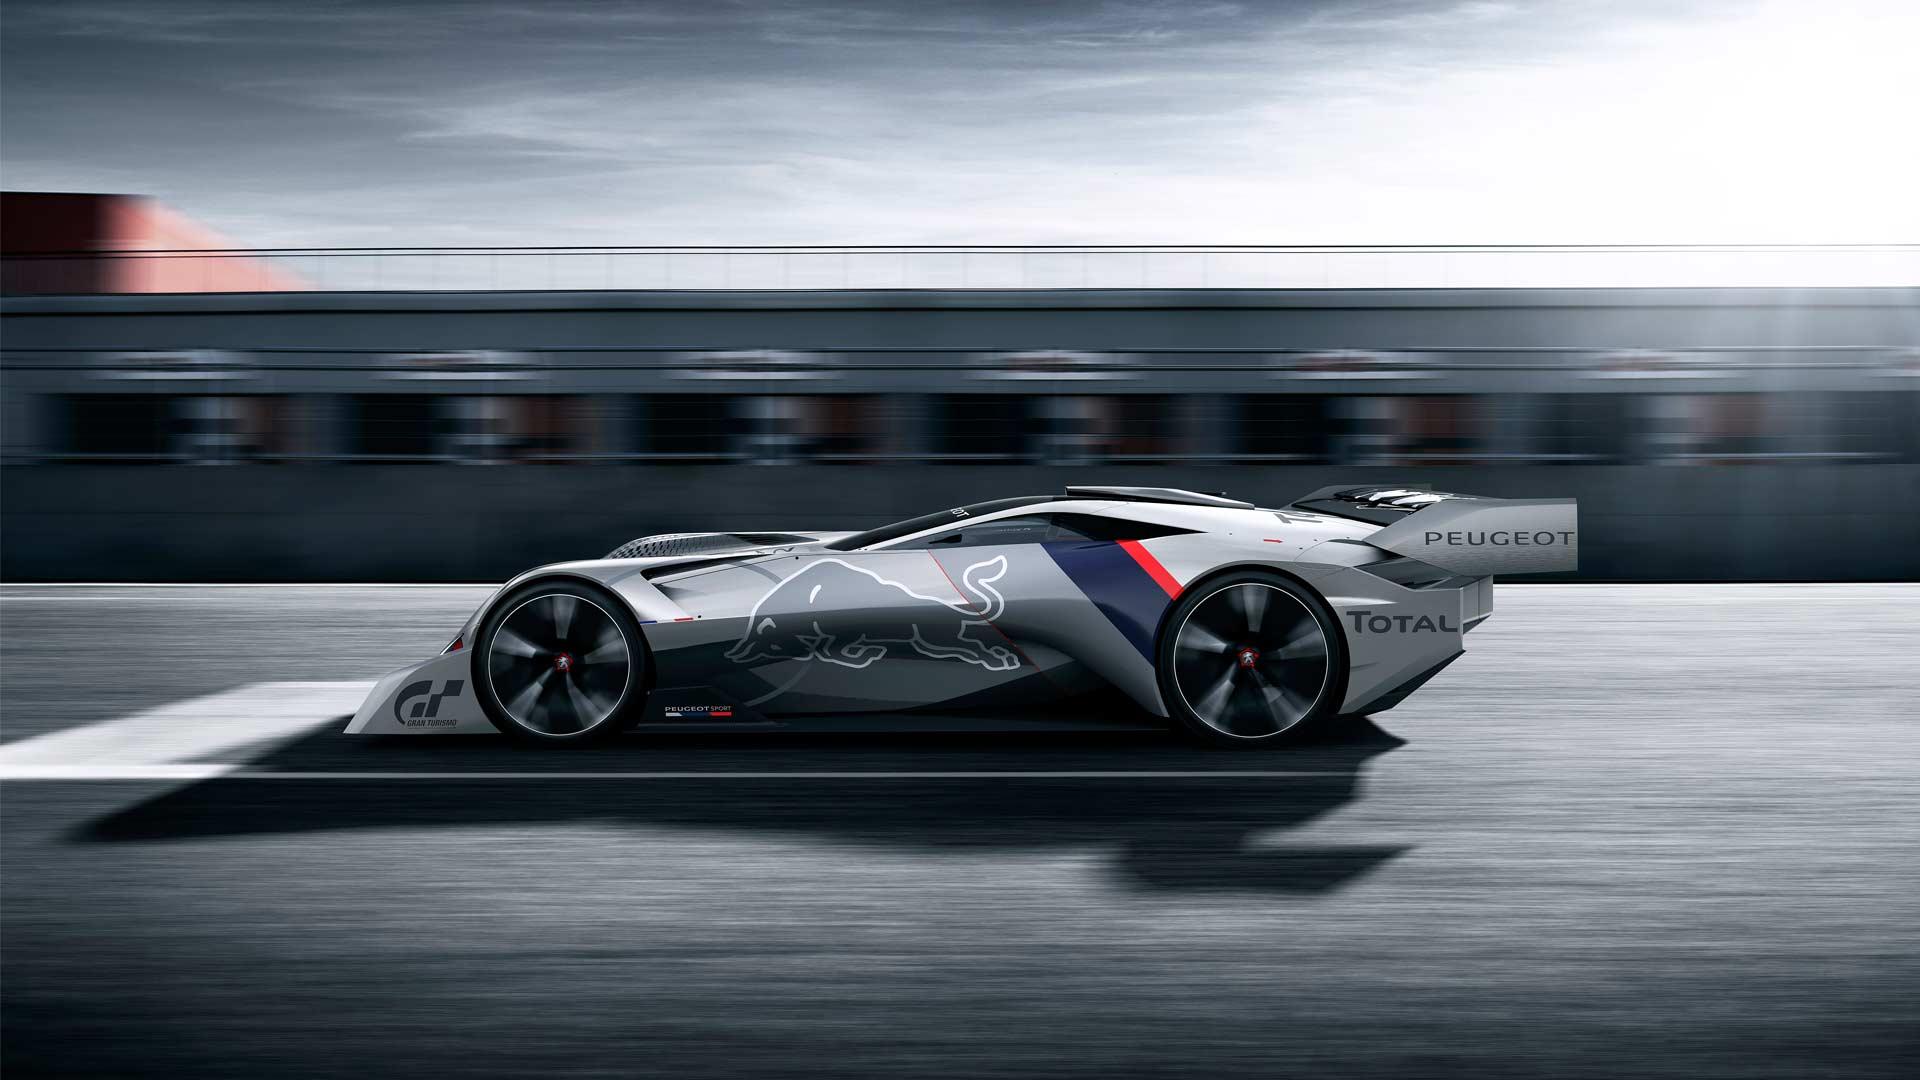 Peugeot-L750-R-Hybrid-Vision-Gran-Turismo_2